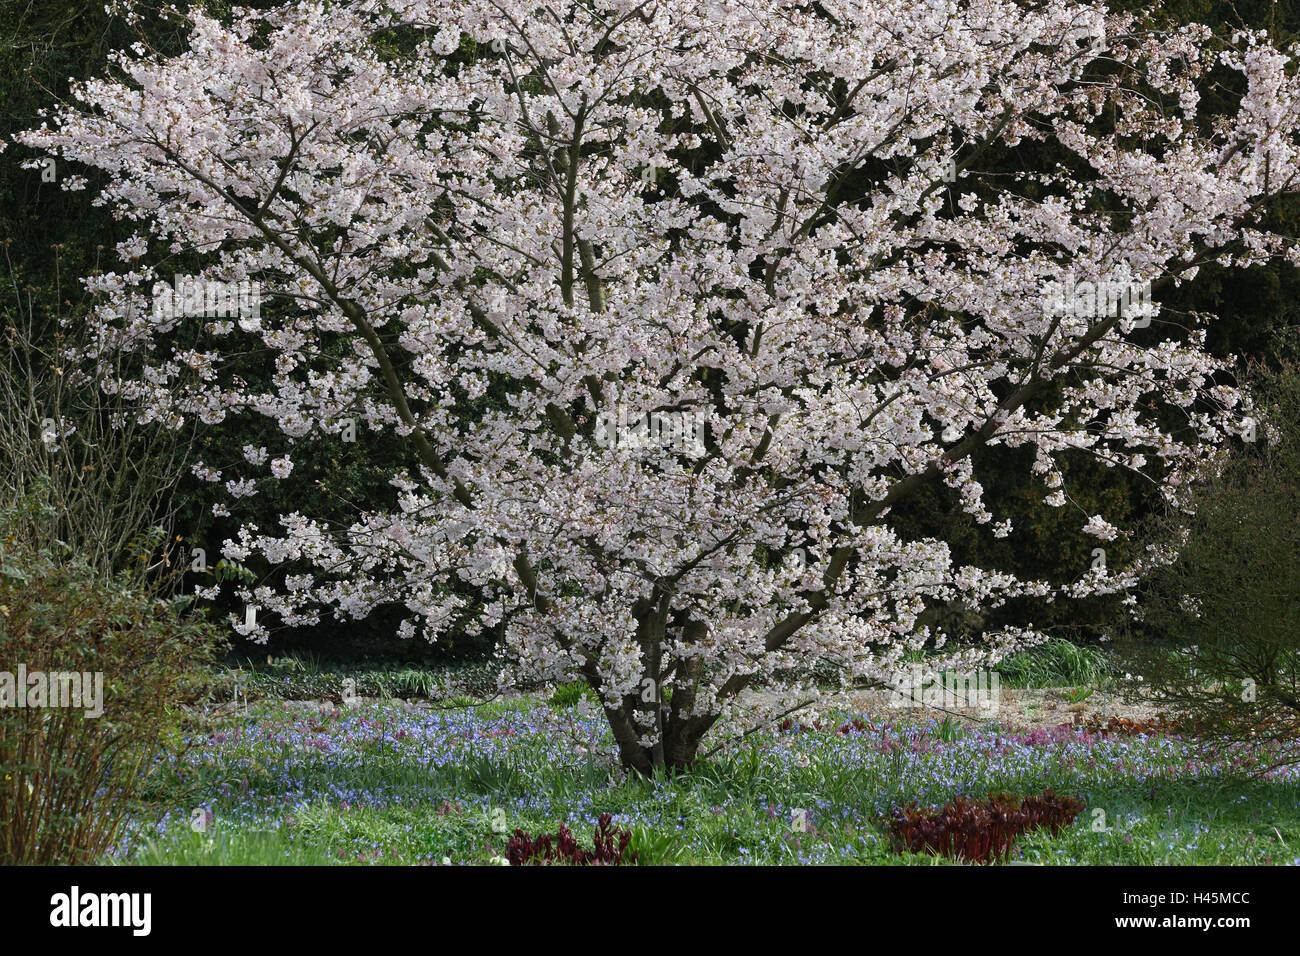 Garden, shrub, Yoshino cherry, blossom, Germany, to ornamental cherry, cherry, Rosaceae, tree, period bloom, spring, - Stock Image